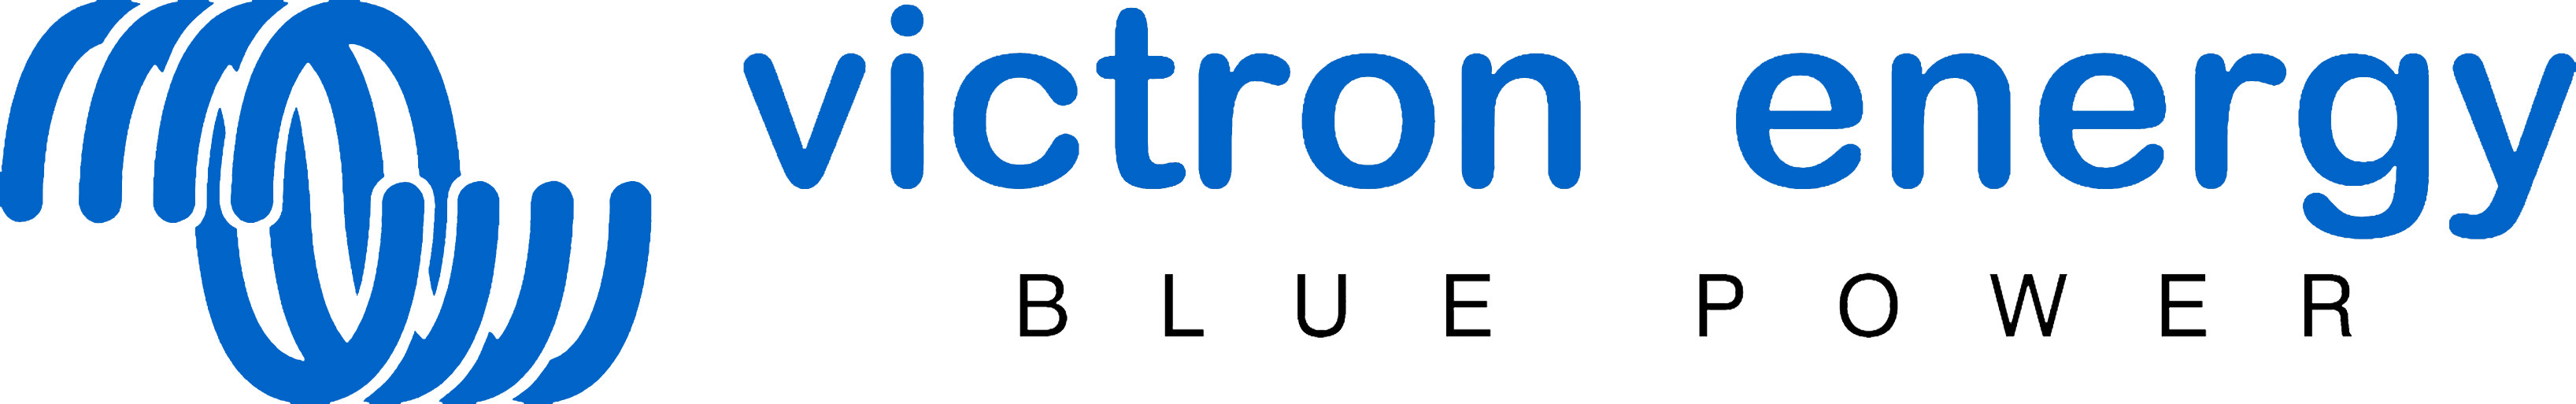 victron_logo_1.jpg